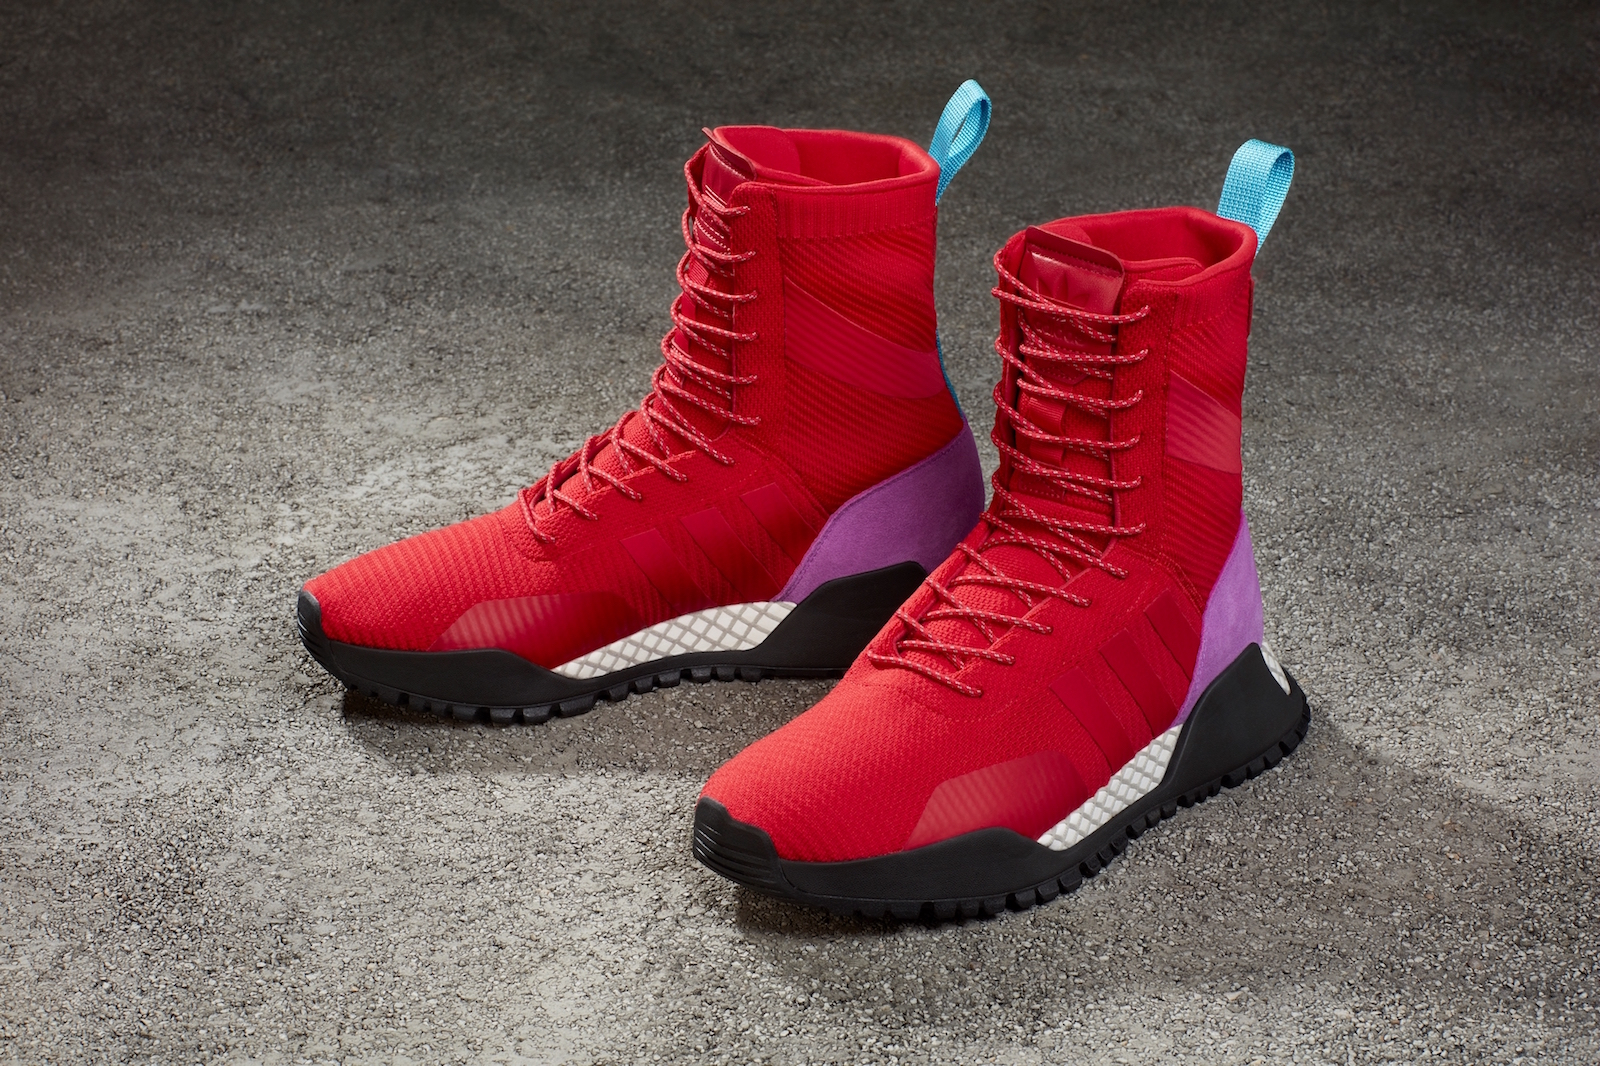 adidas NMD XR1 Winter PrimeKnit PK Scarlet Red